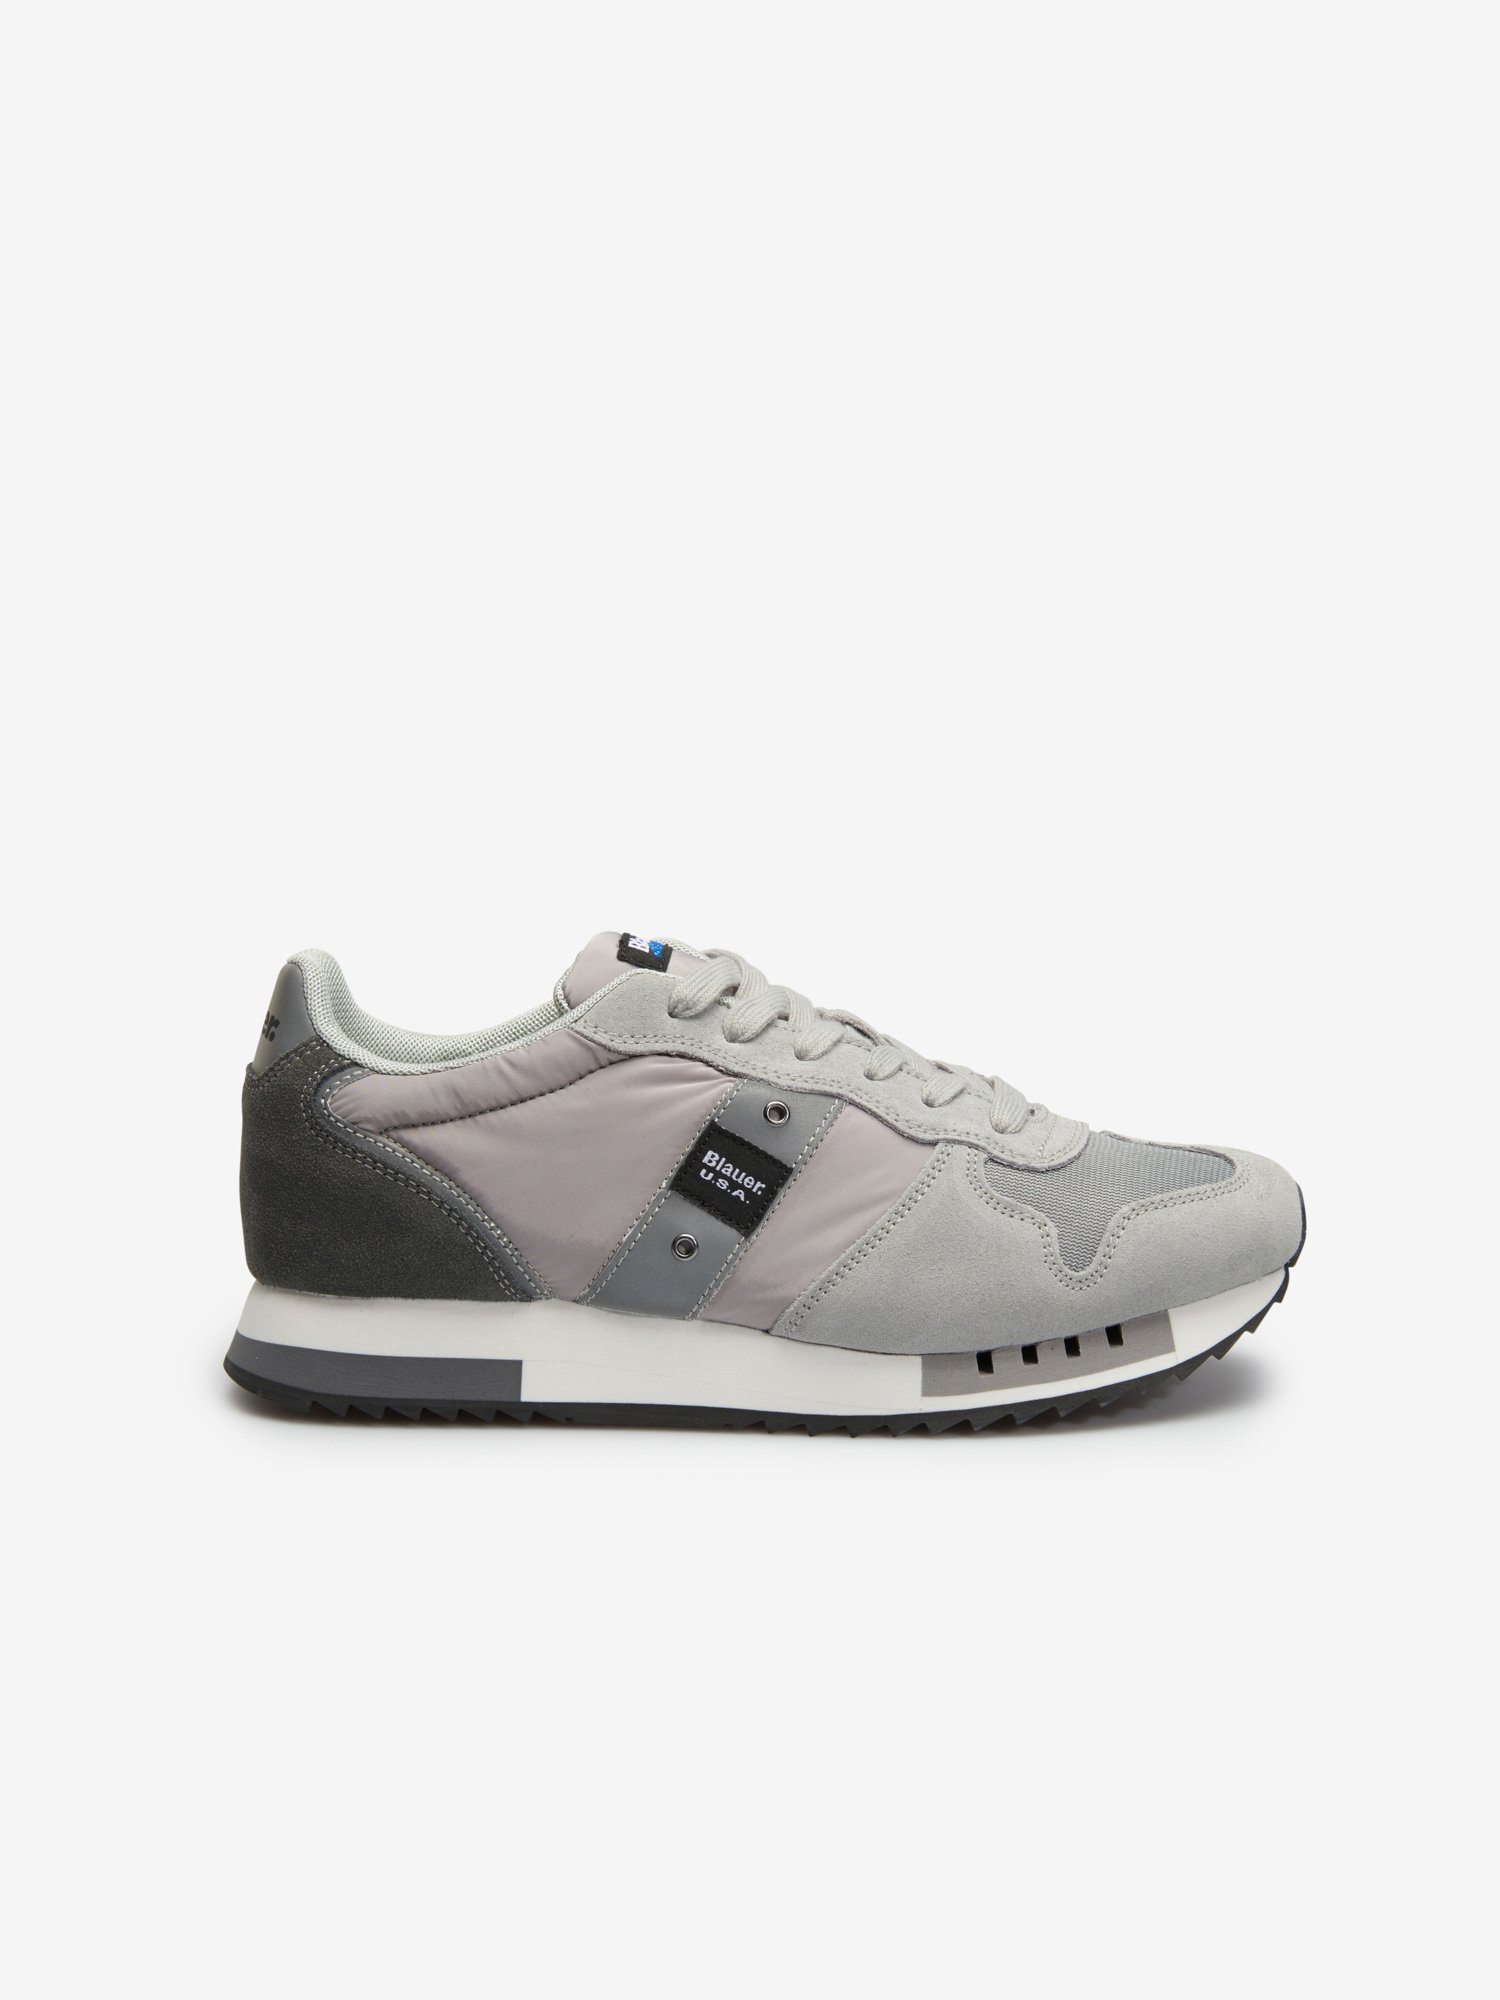 Blauer - Queens Sneakers man - Limestone - Blauer